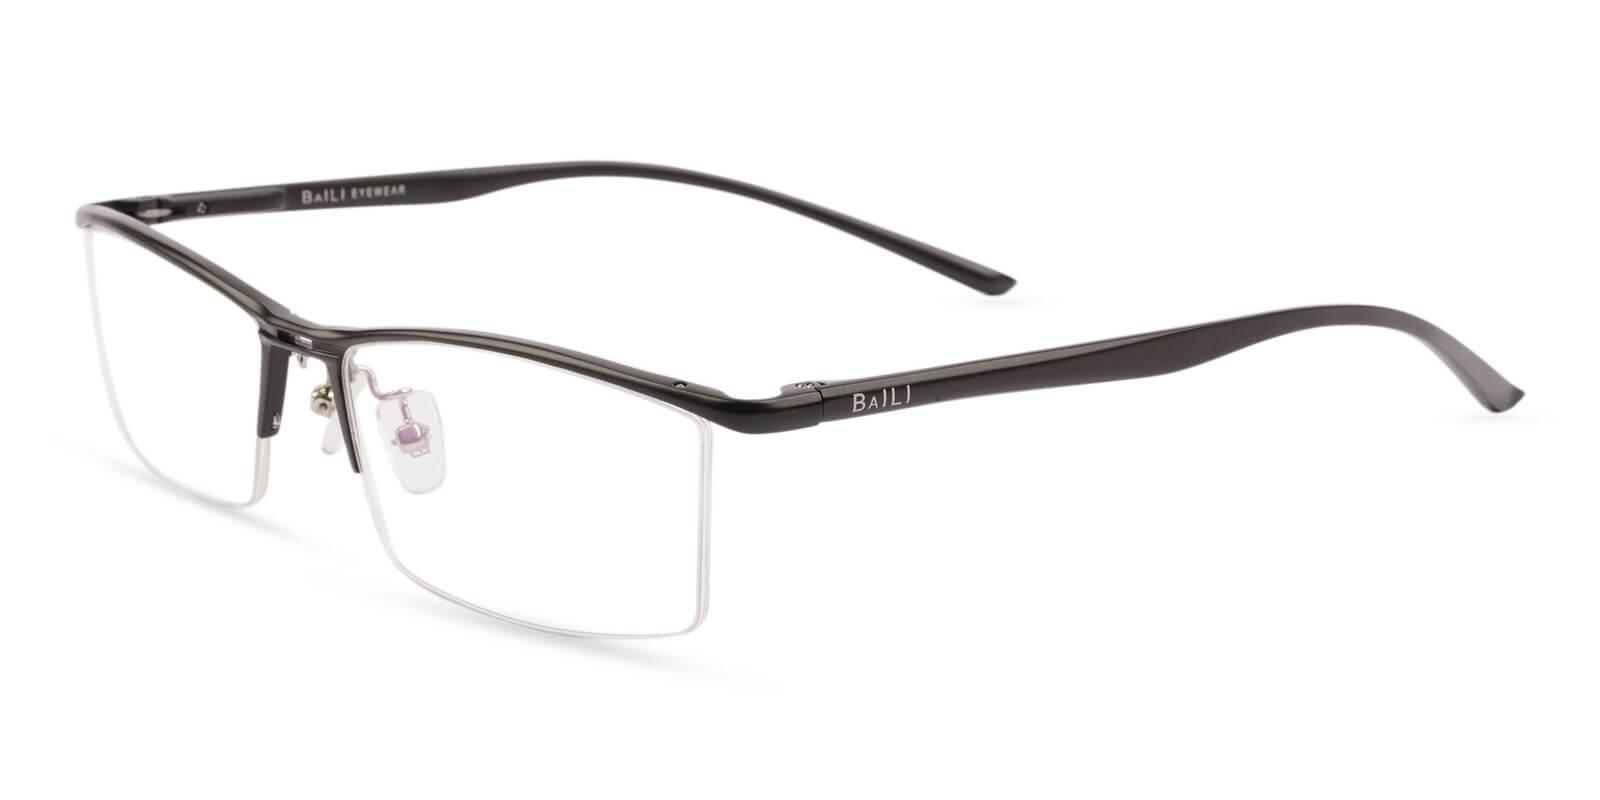 Mateo Black Metal Eyeglasses , NosePads , SpringHinges Frames from ABBE Glasses